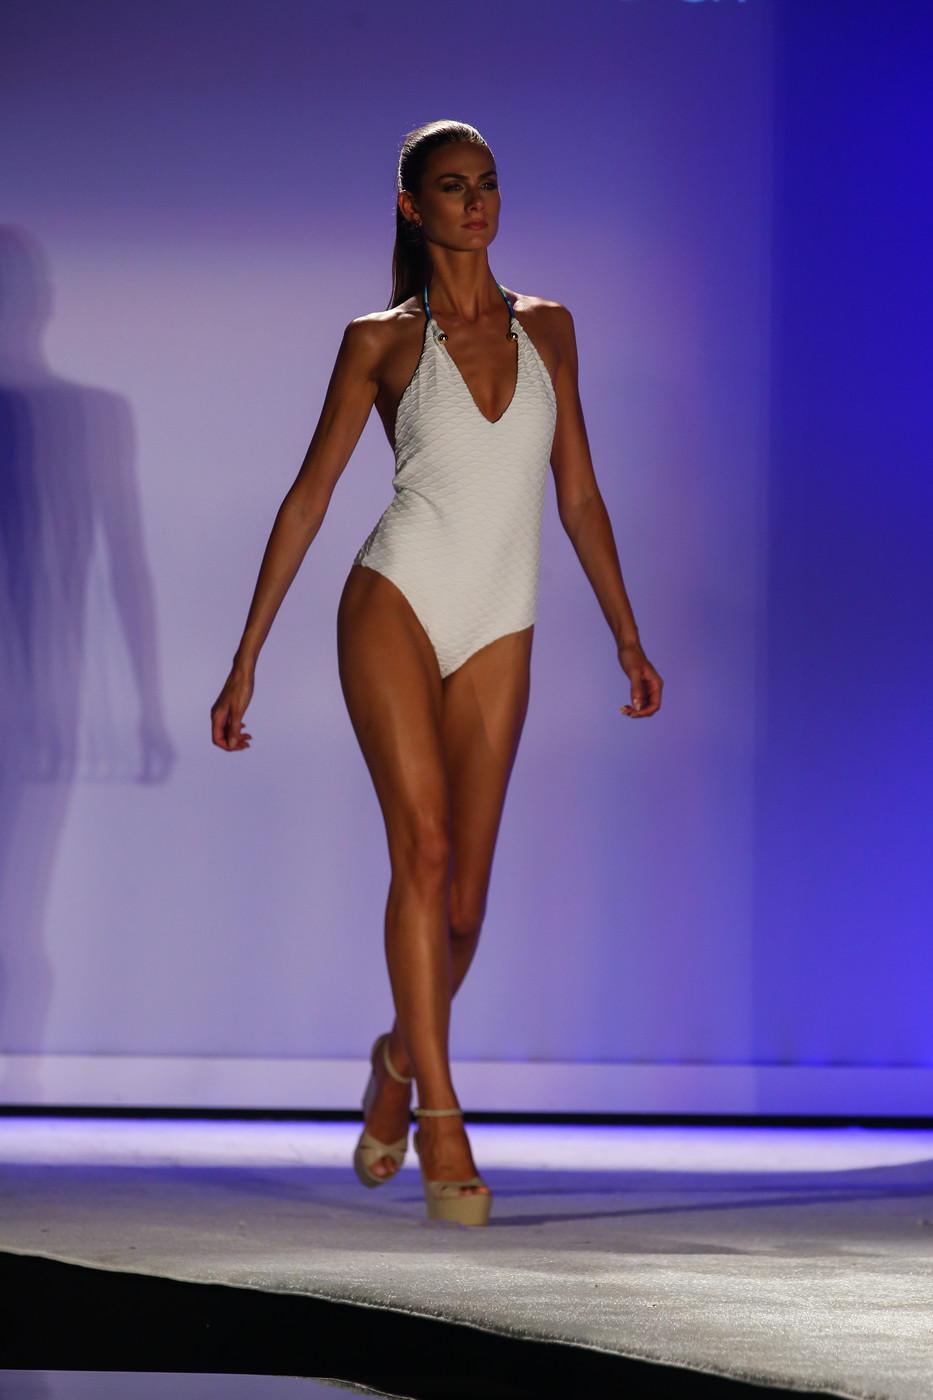 Fashion tv swimwear video 59